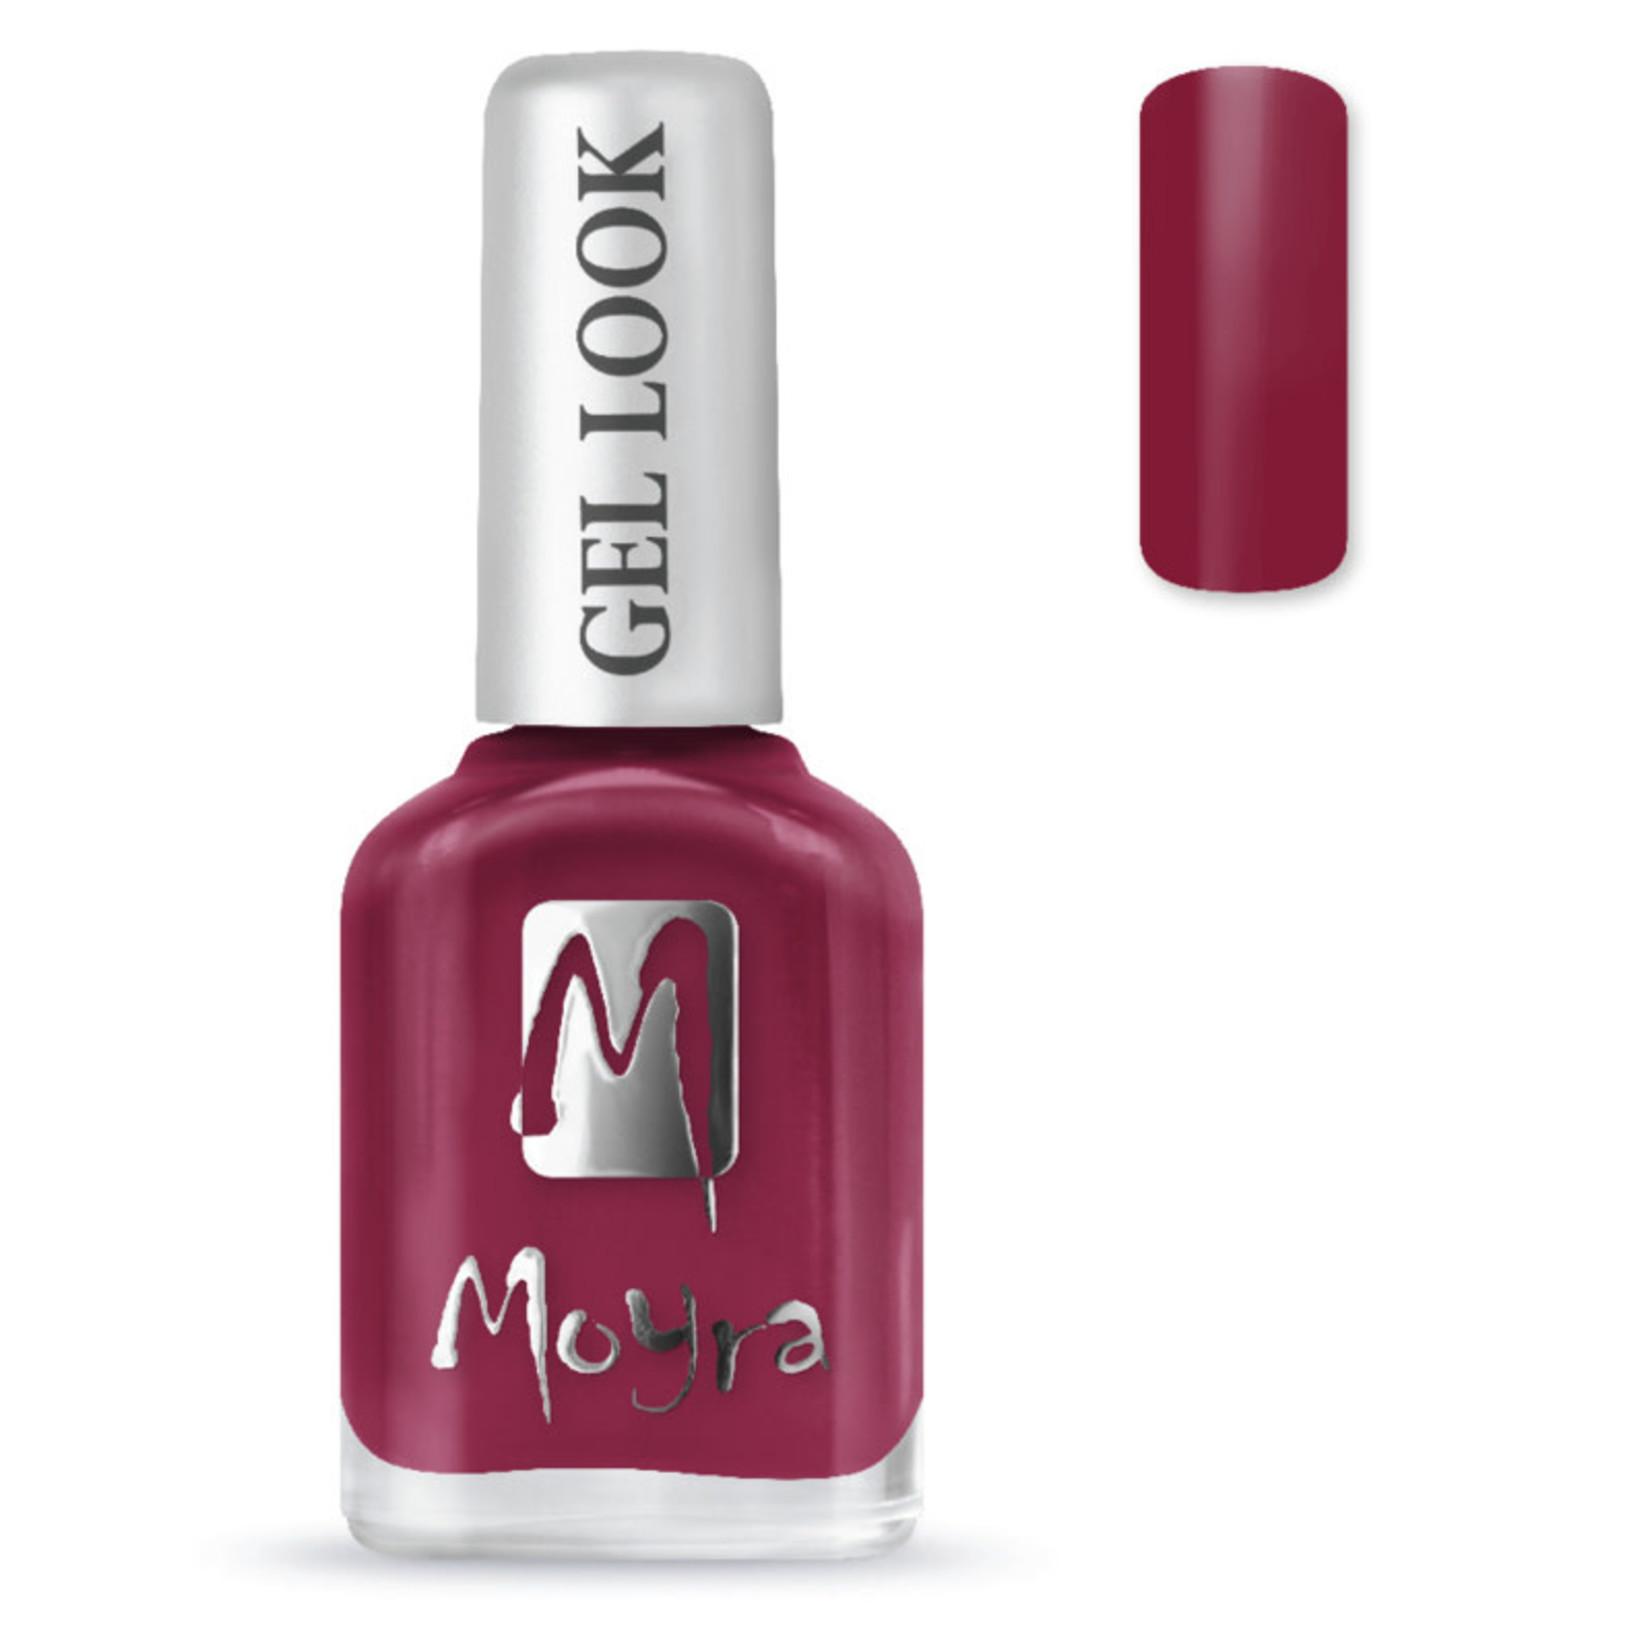 Moyra Moyra Gel Look nail polish 910 Celeste